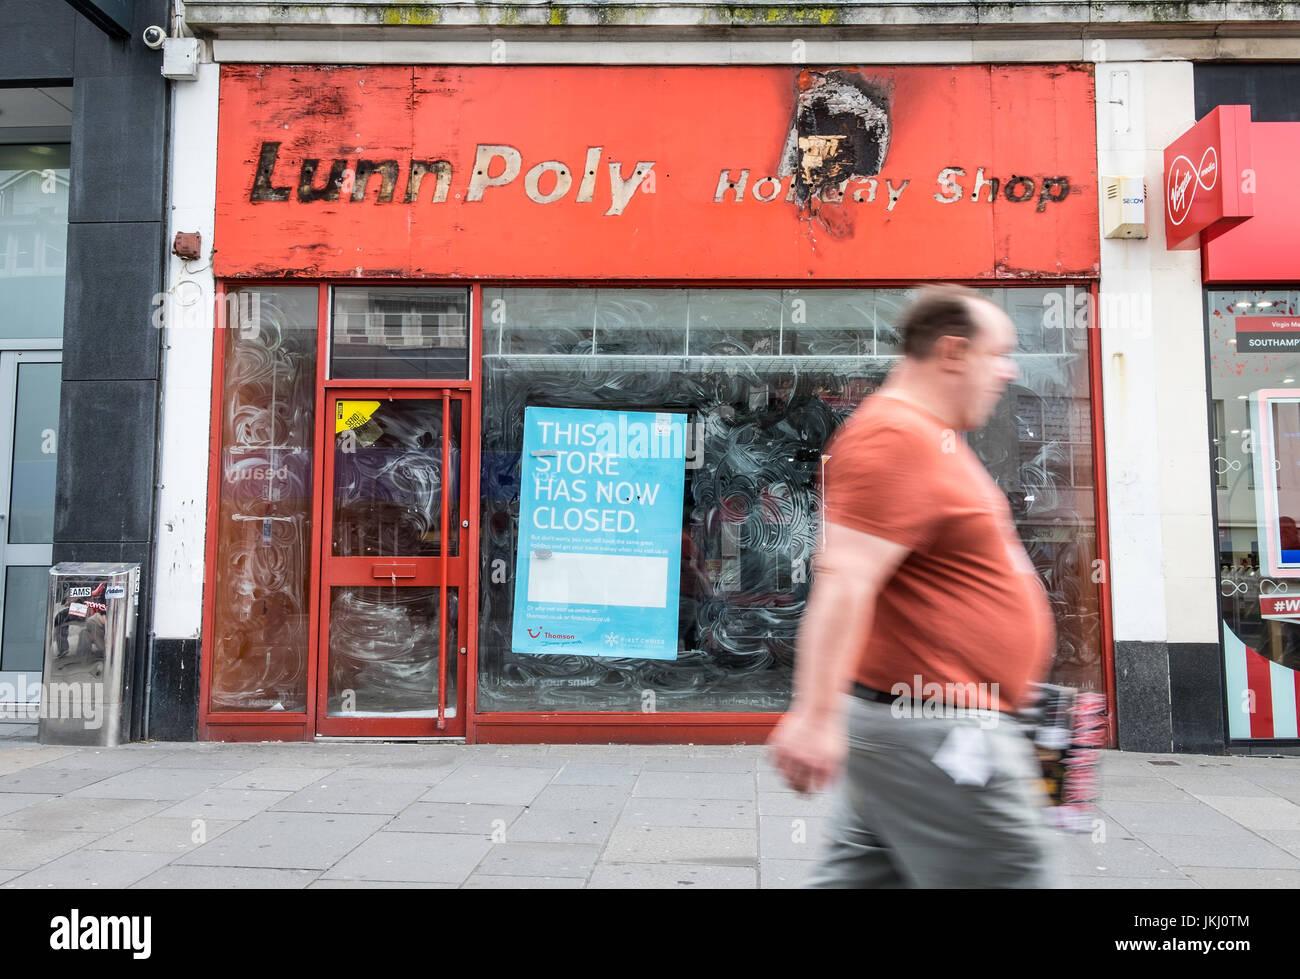 Herunterfahren-Reisebüro-Shop in Southampton High Street Stockbild